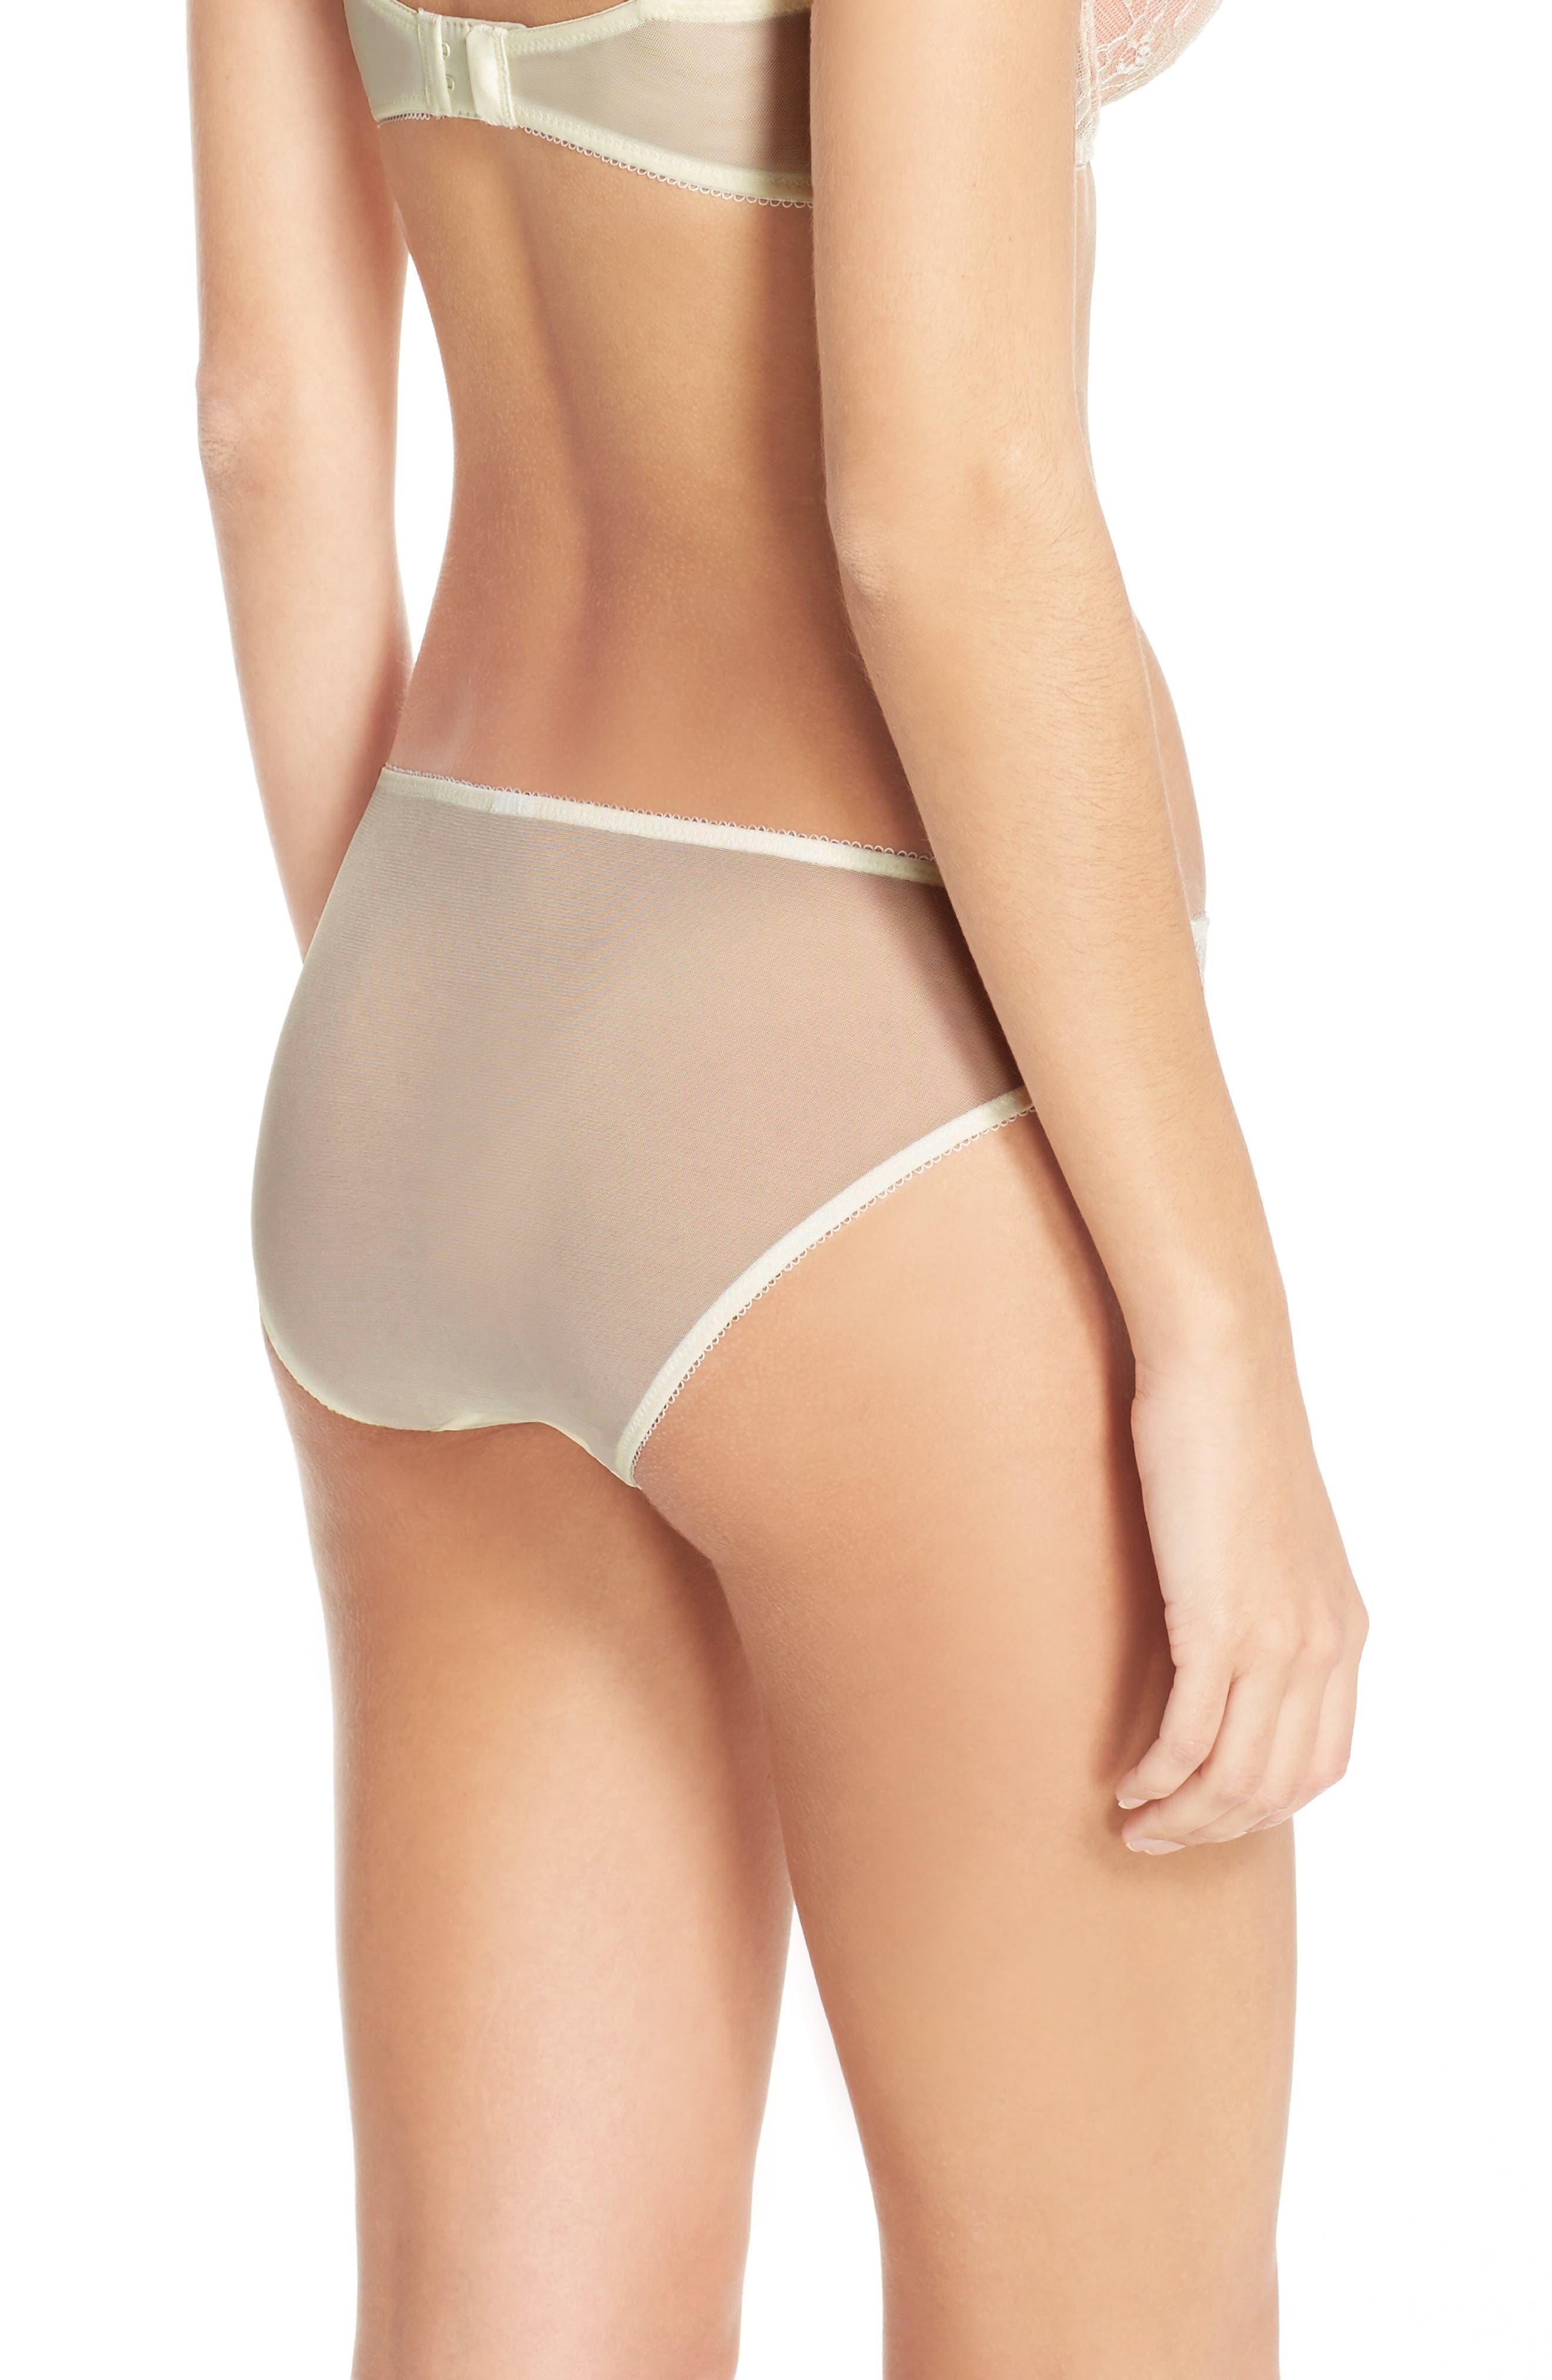 'B Sultry' Bikini,                             Alternate thumbnail 8, color,                             VANILLA ICE/ PEACH BEIGE